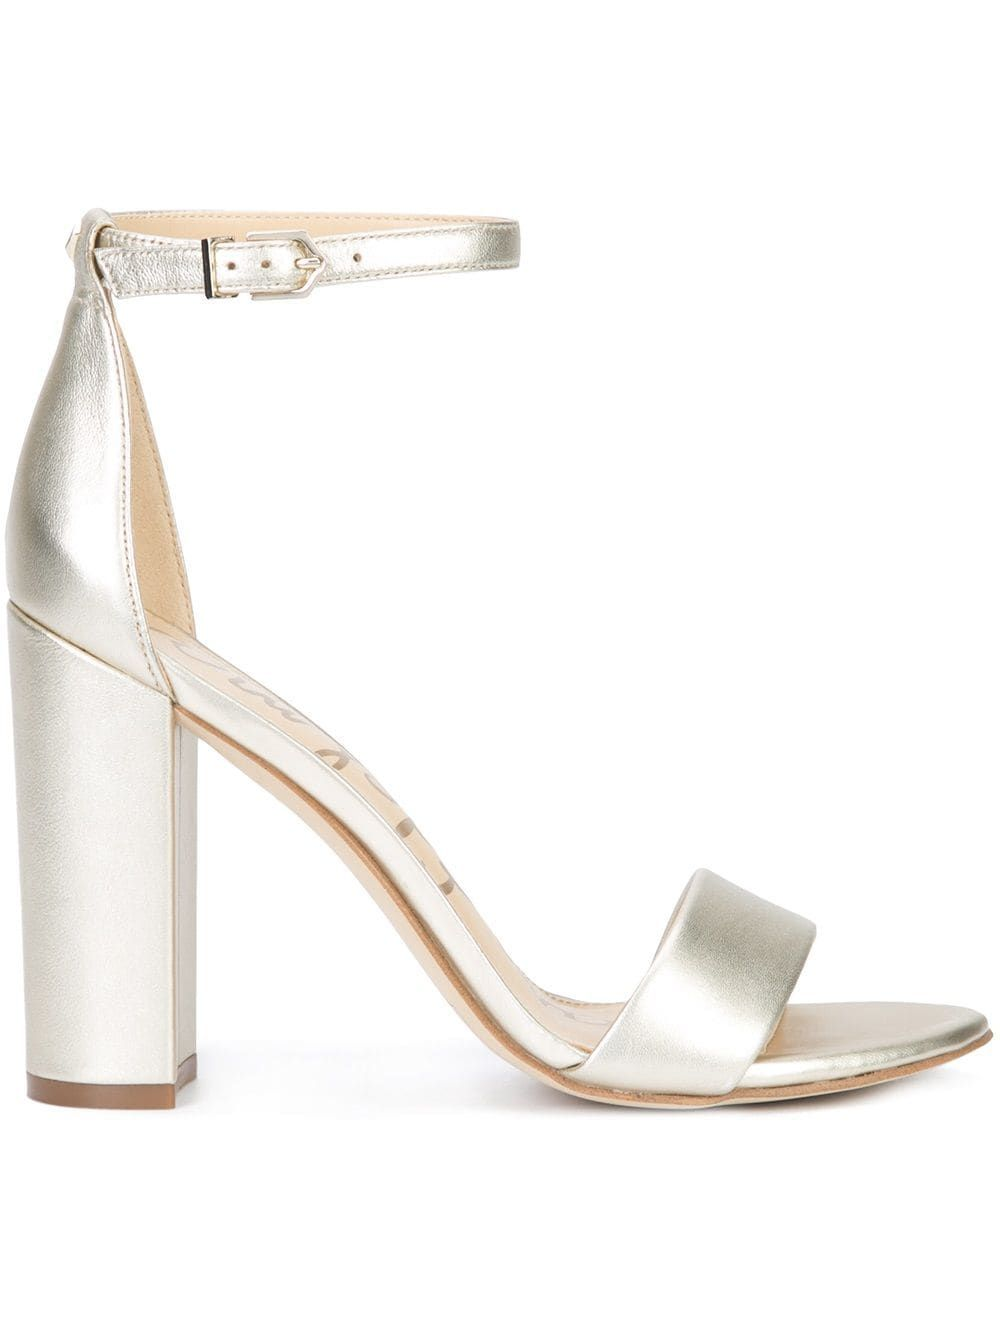 9621a8604ec Sam Edelman Yaro sandals - Metallic in 2019 | Products | Sandals